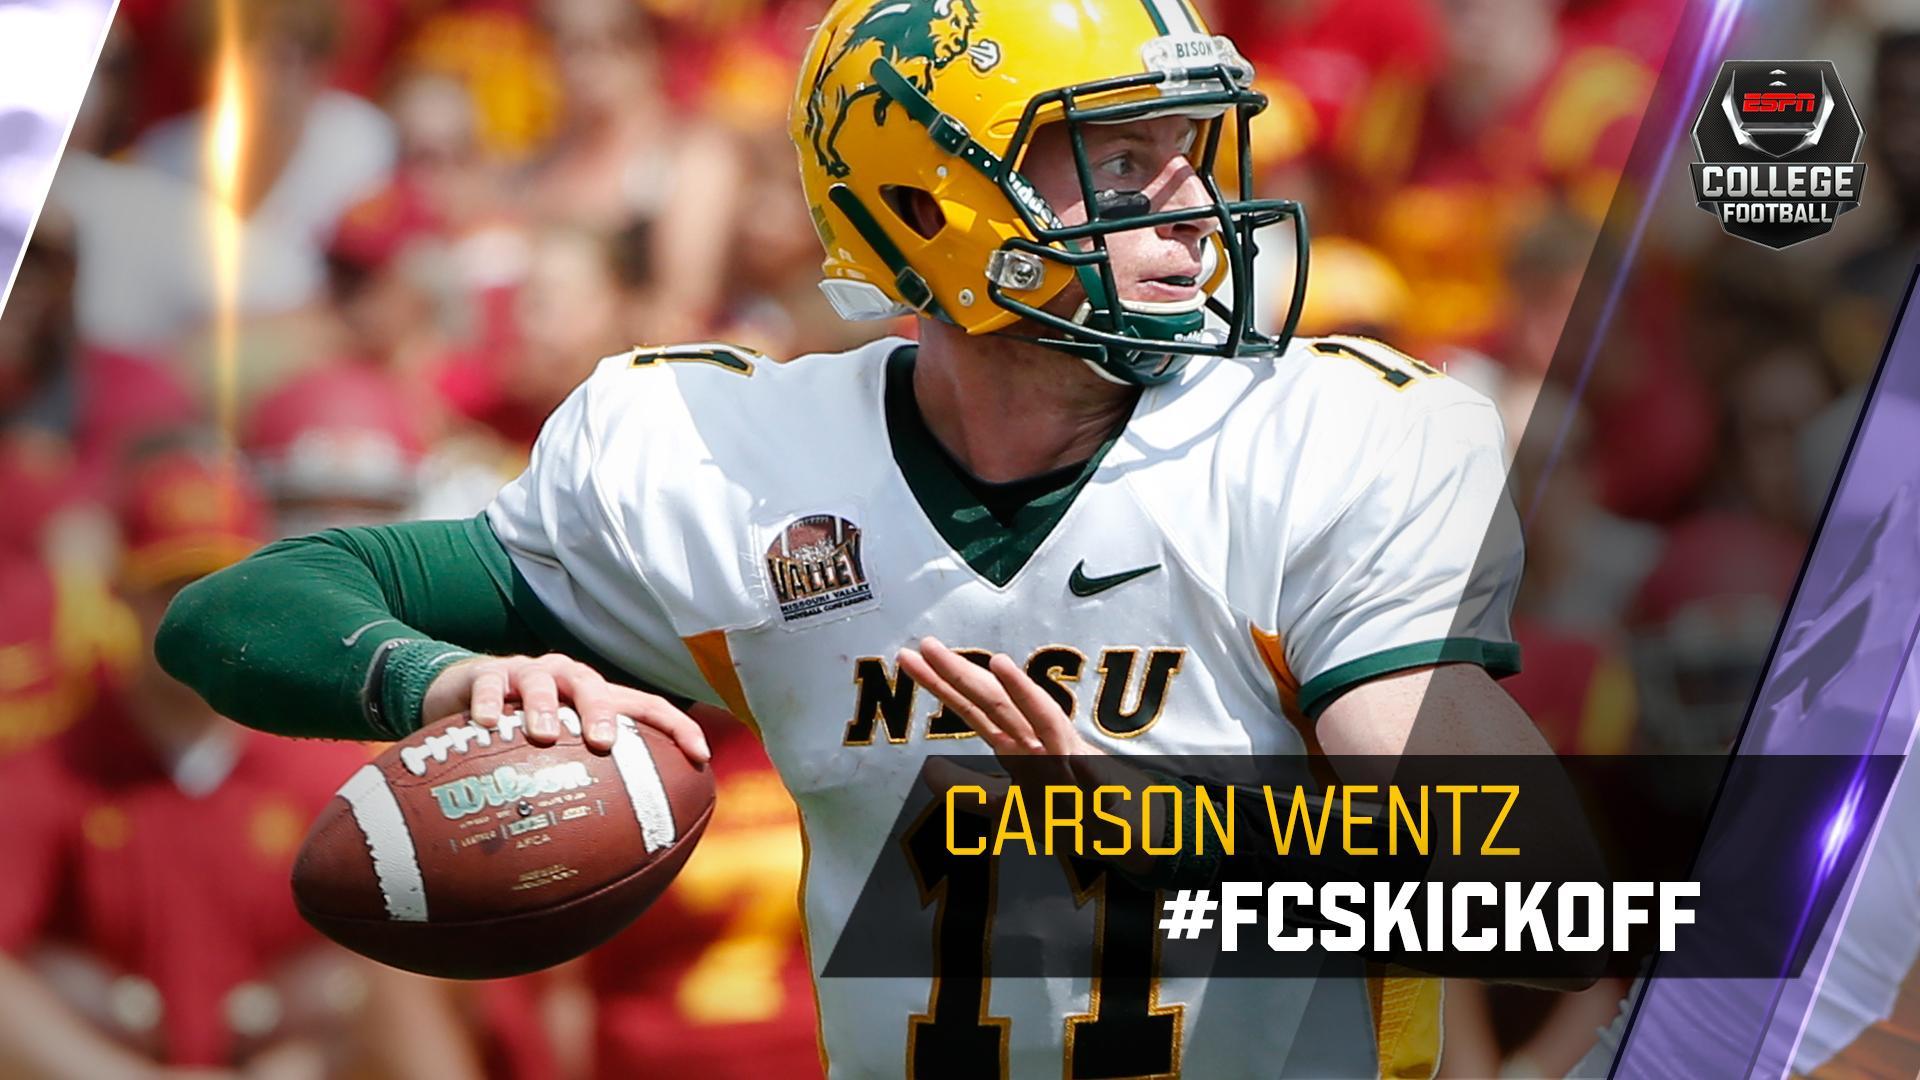 Espn College Football On Twitter Carson Wentz Ndsu 2015 Fcs